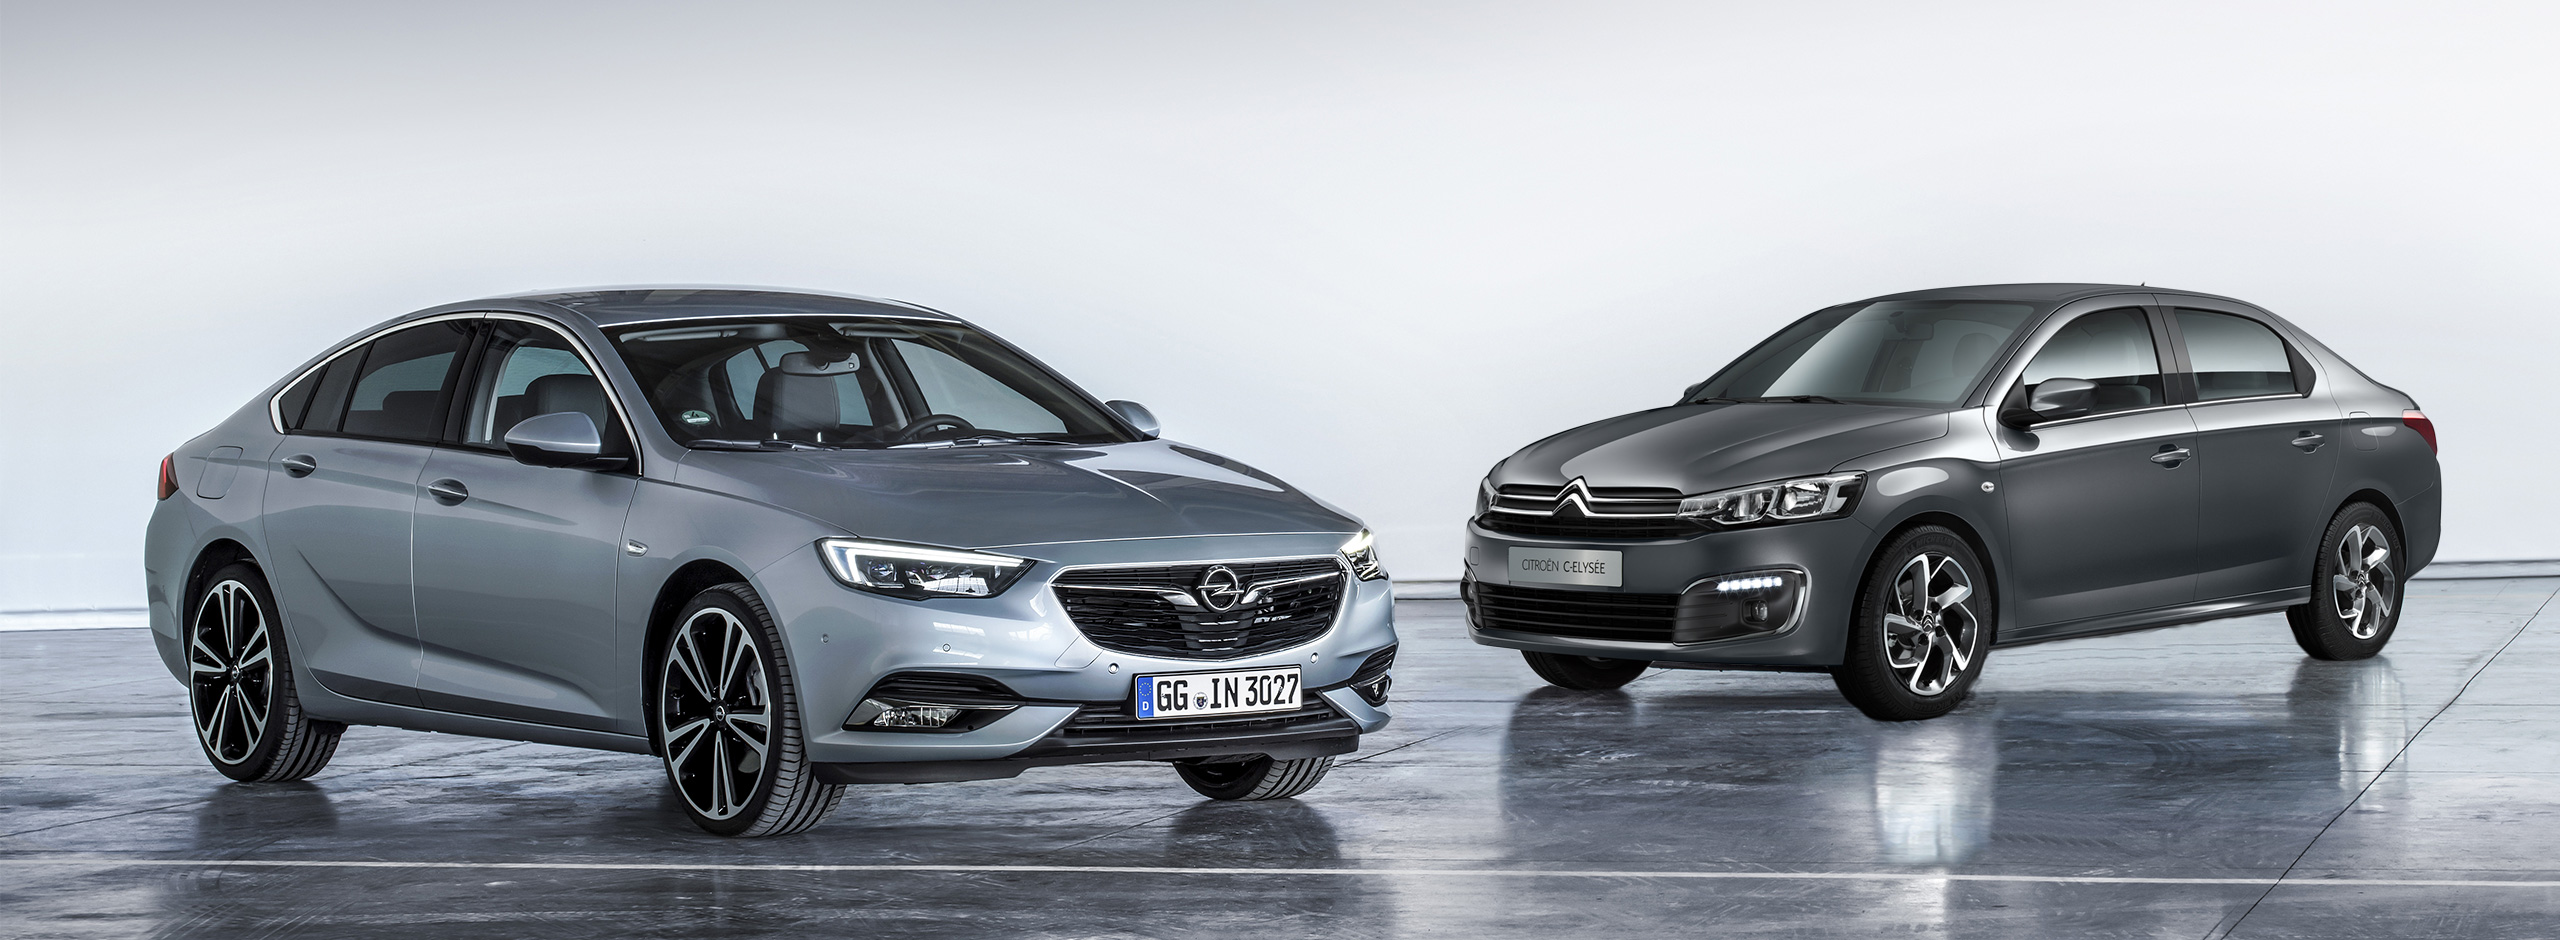 Opel Insignia und Citroen Elysee